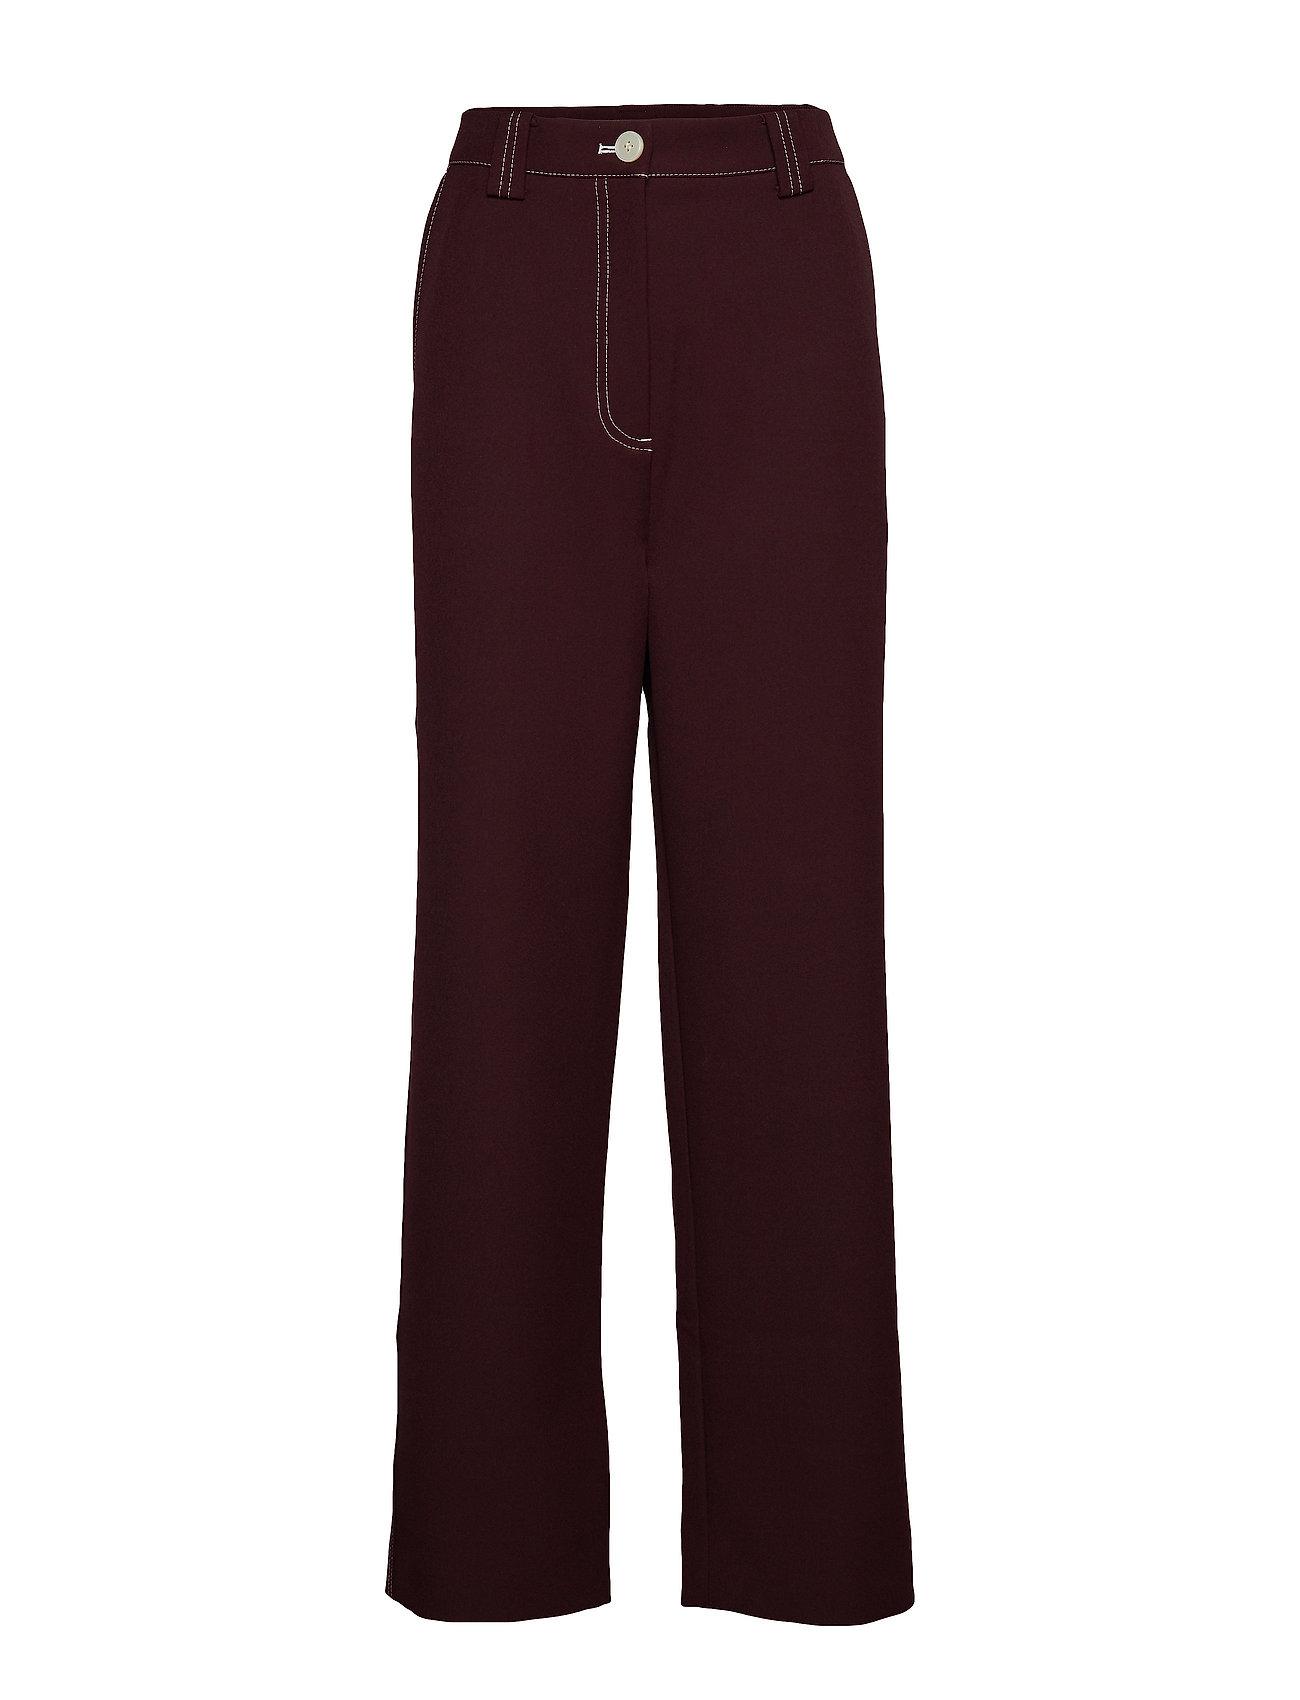 STINE GOYA John, 617 Solid Tailoring - 1513 MULBERRY